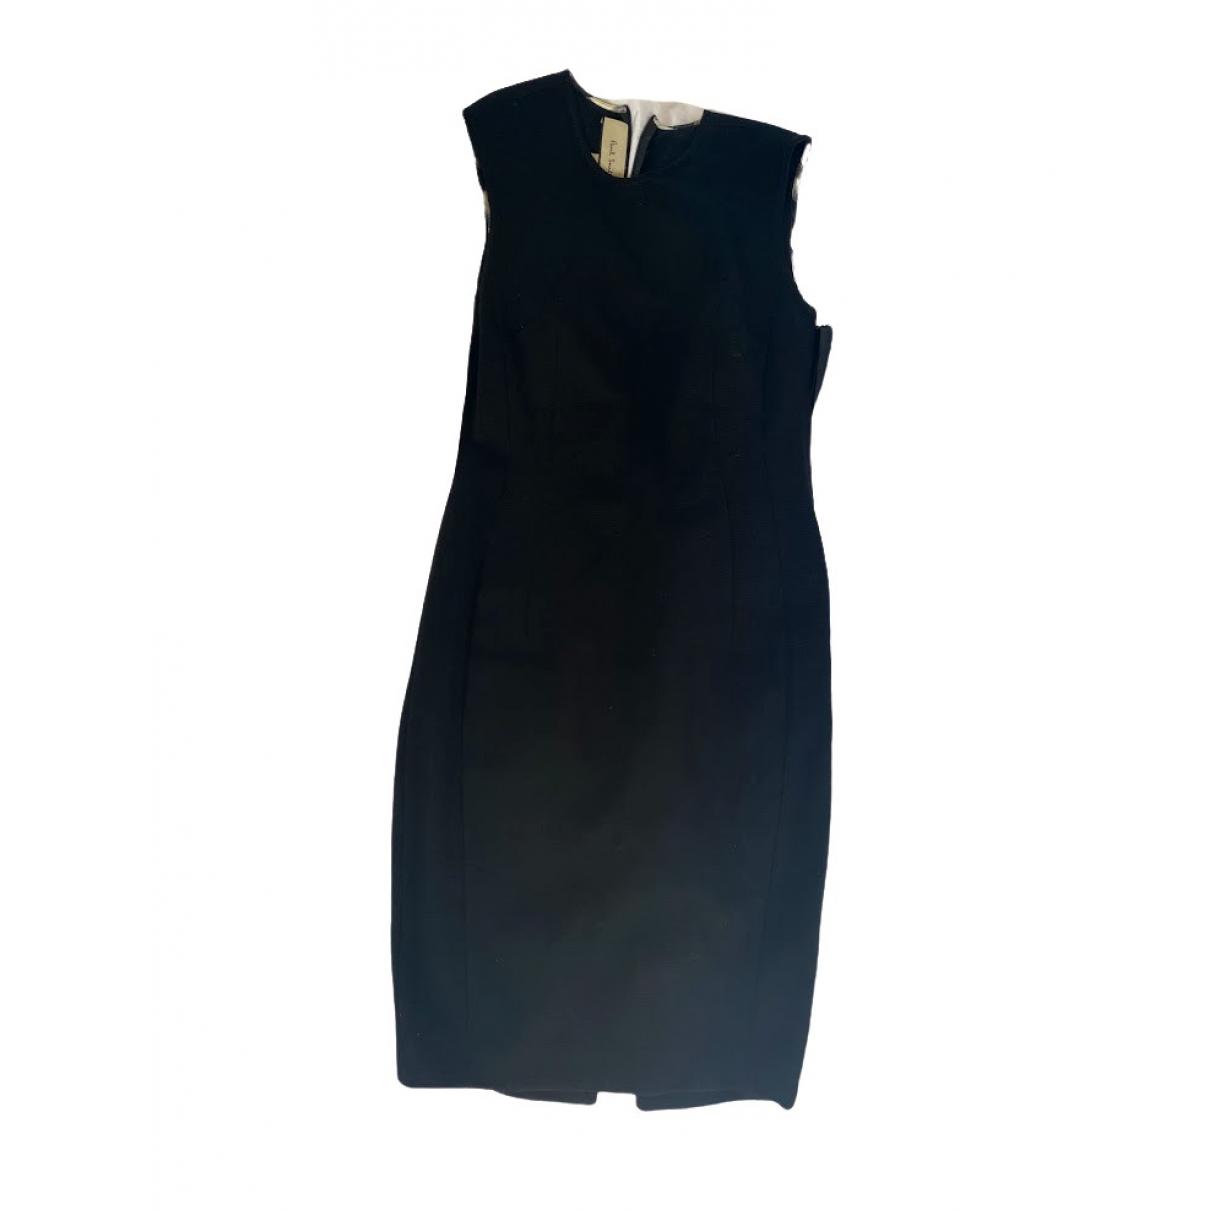 Paul Smith \N Kleid in  Schwarz Baumwolle